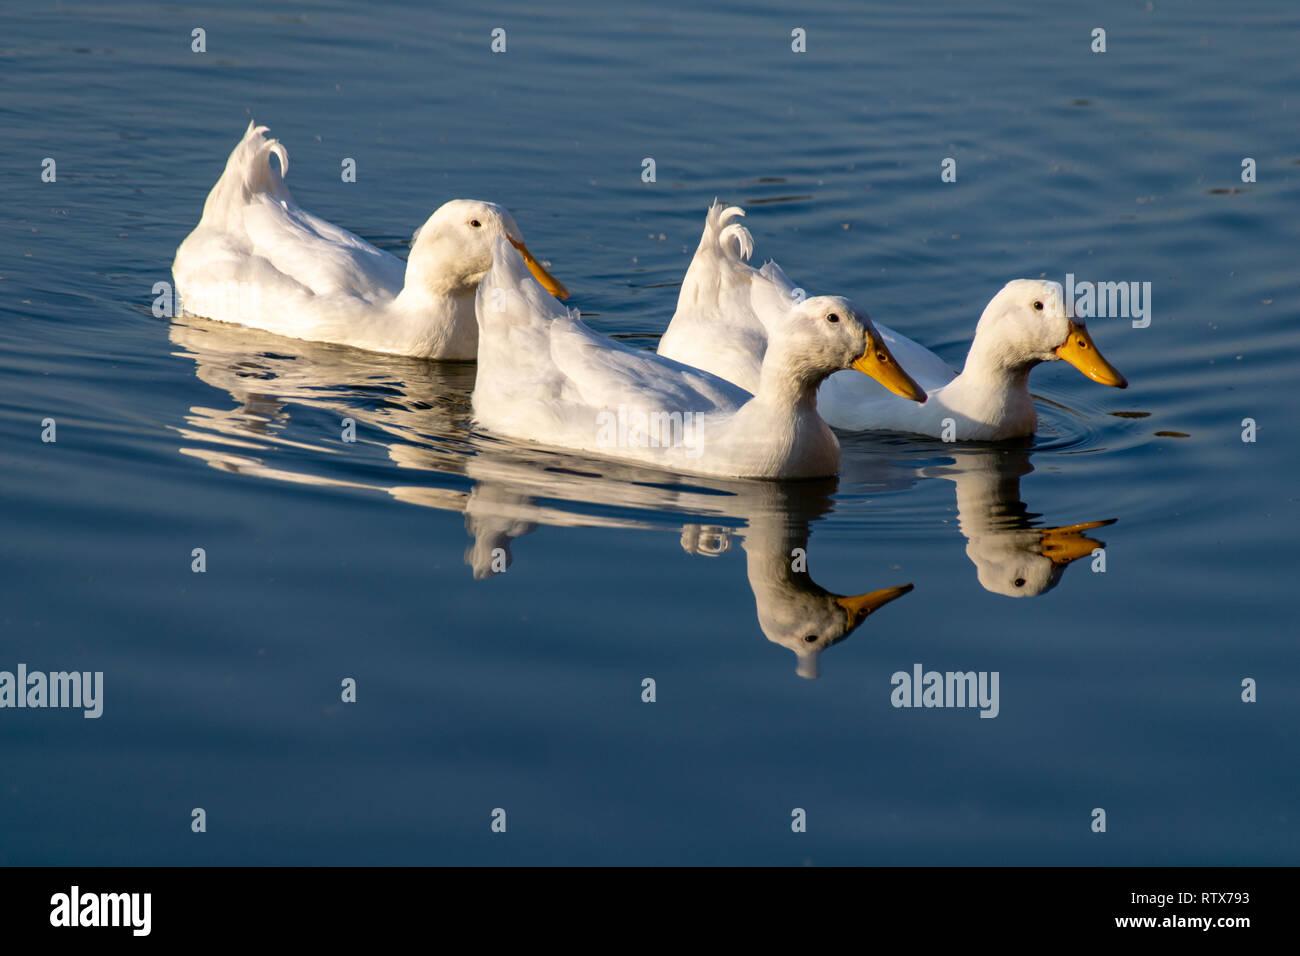 American pekin white ducks swimming across a still lake at sunset Stock Photo